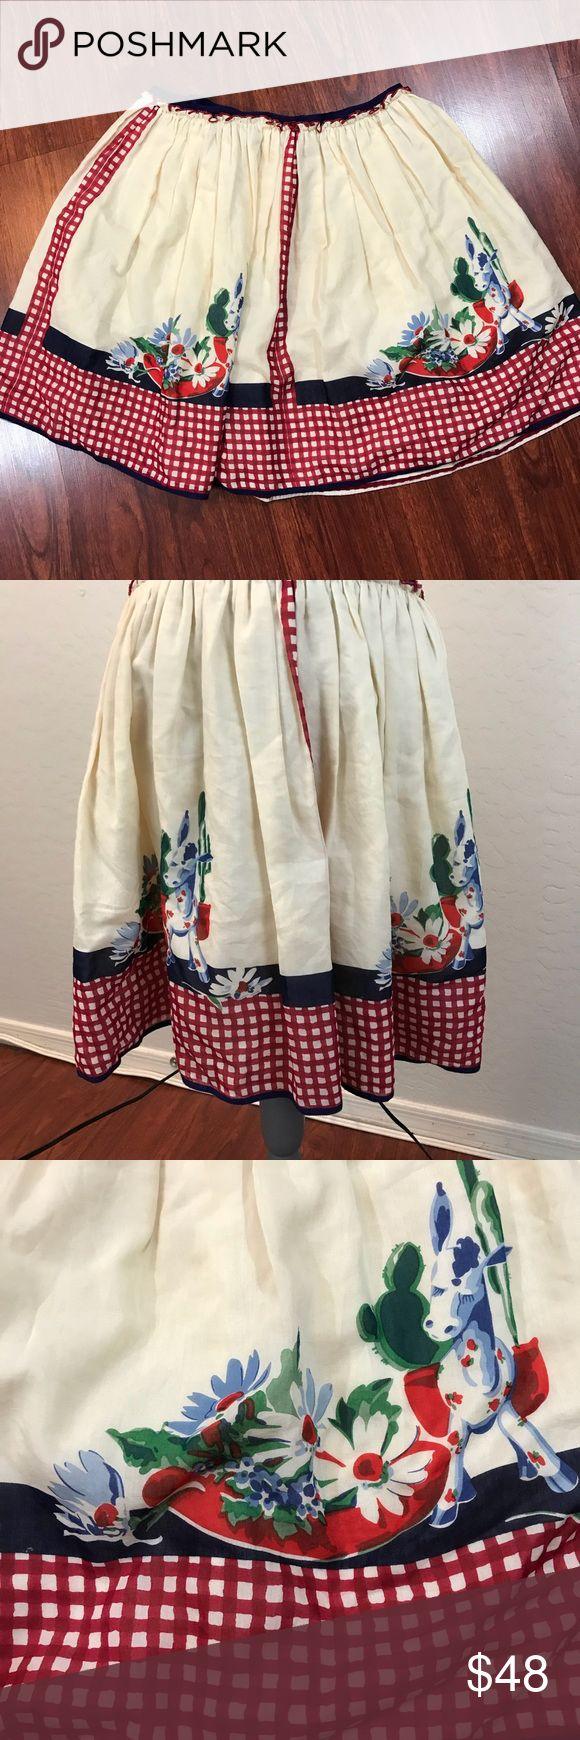 "Anthropologie Anna Sui Flare Printed Skirt Sz 8 Beautiful printed A-Line skirt Sz 8 Waist measures 31"" Length 20"" Anna Sui Skirts Mini"